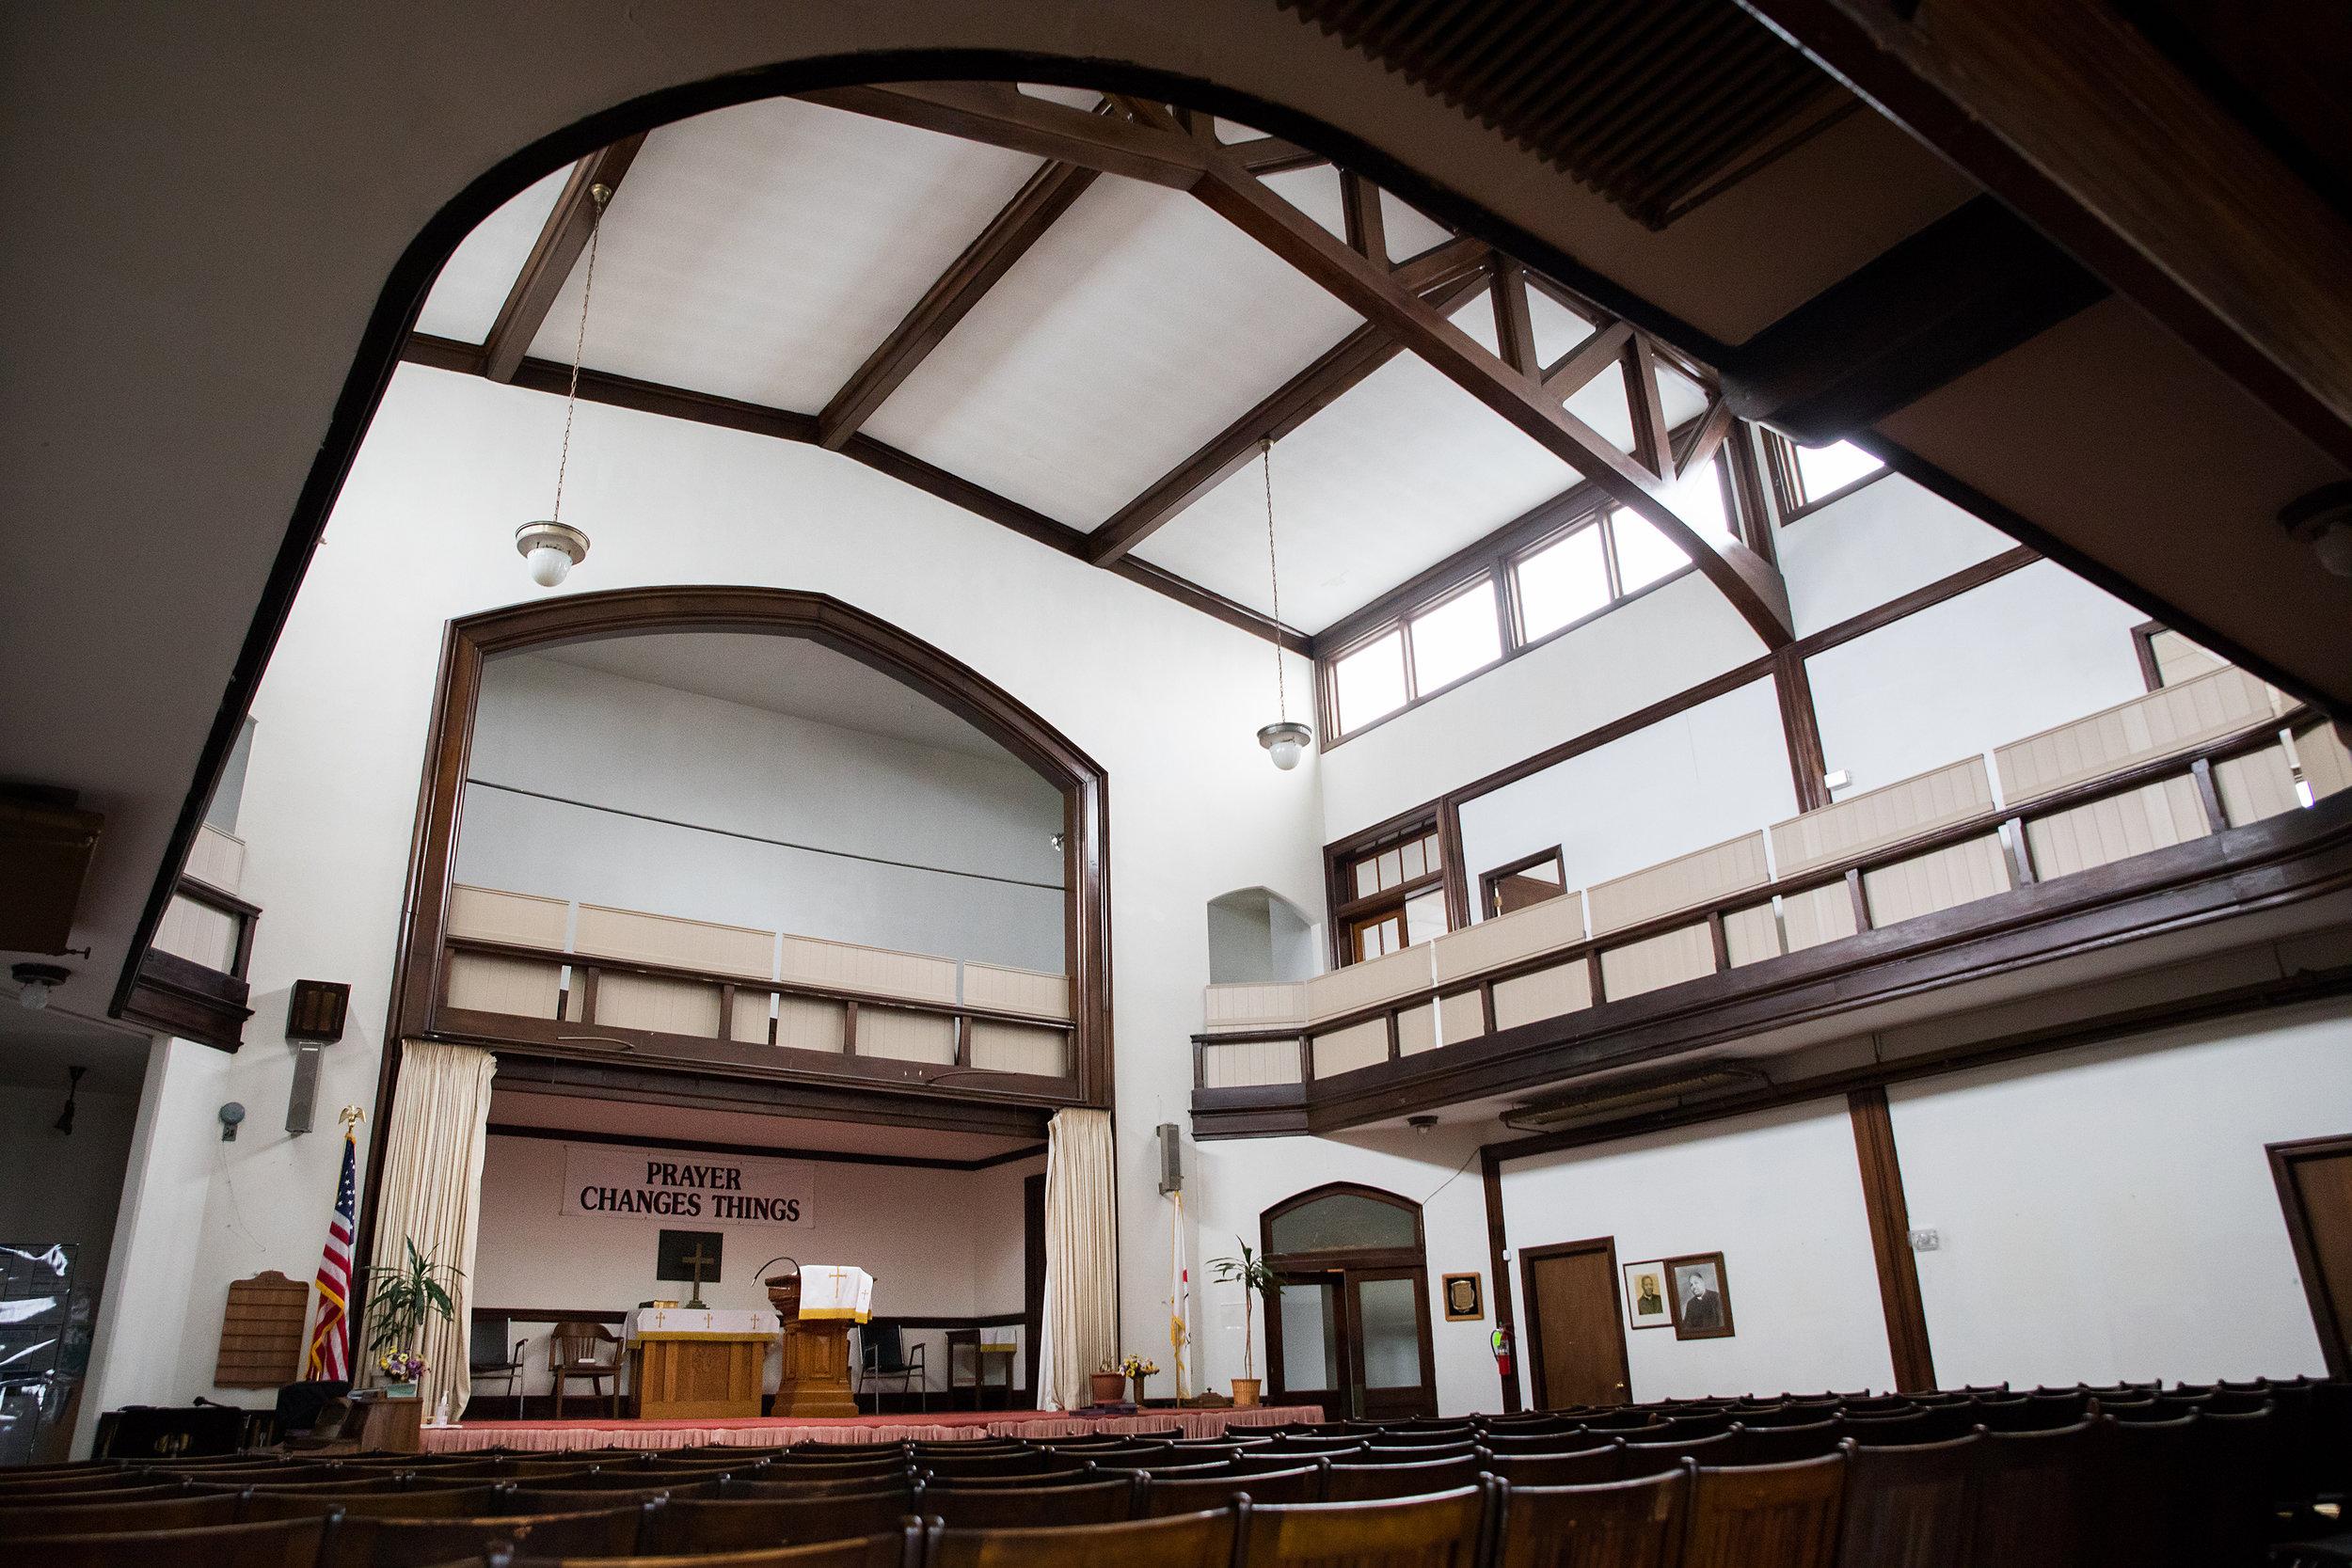 COMMUNITY CORNERSTONE - WHARTON-WESLEY UNITED METHODIST CHURCH